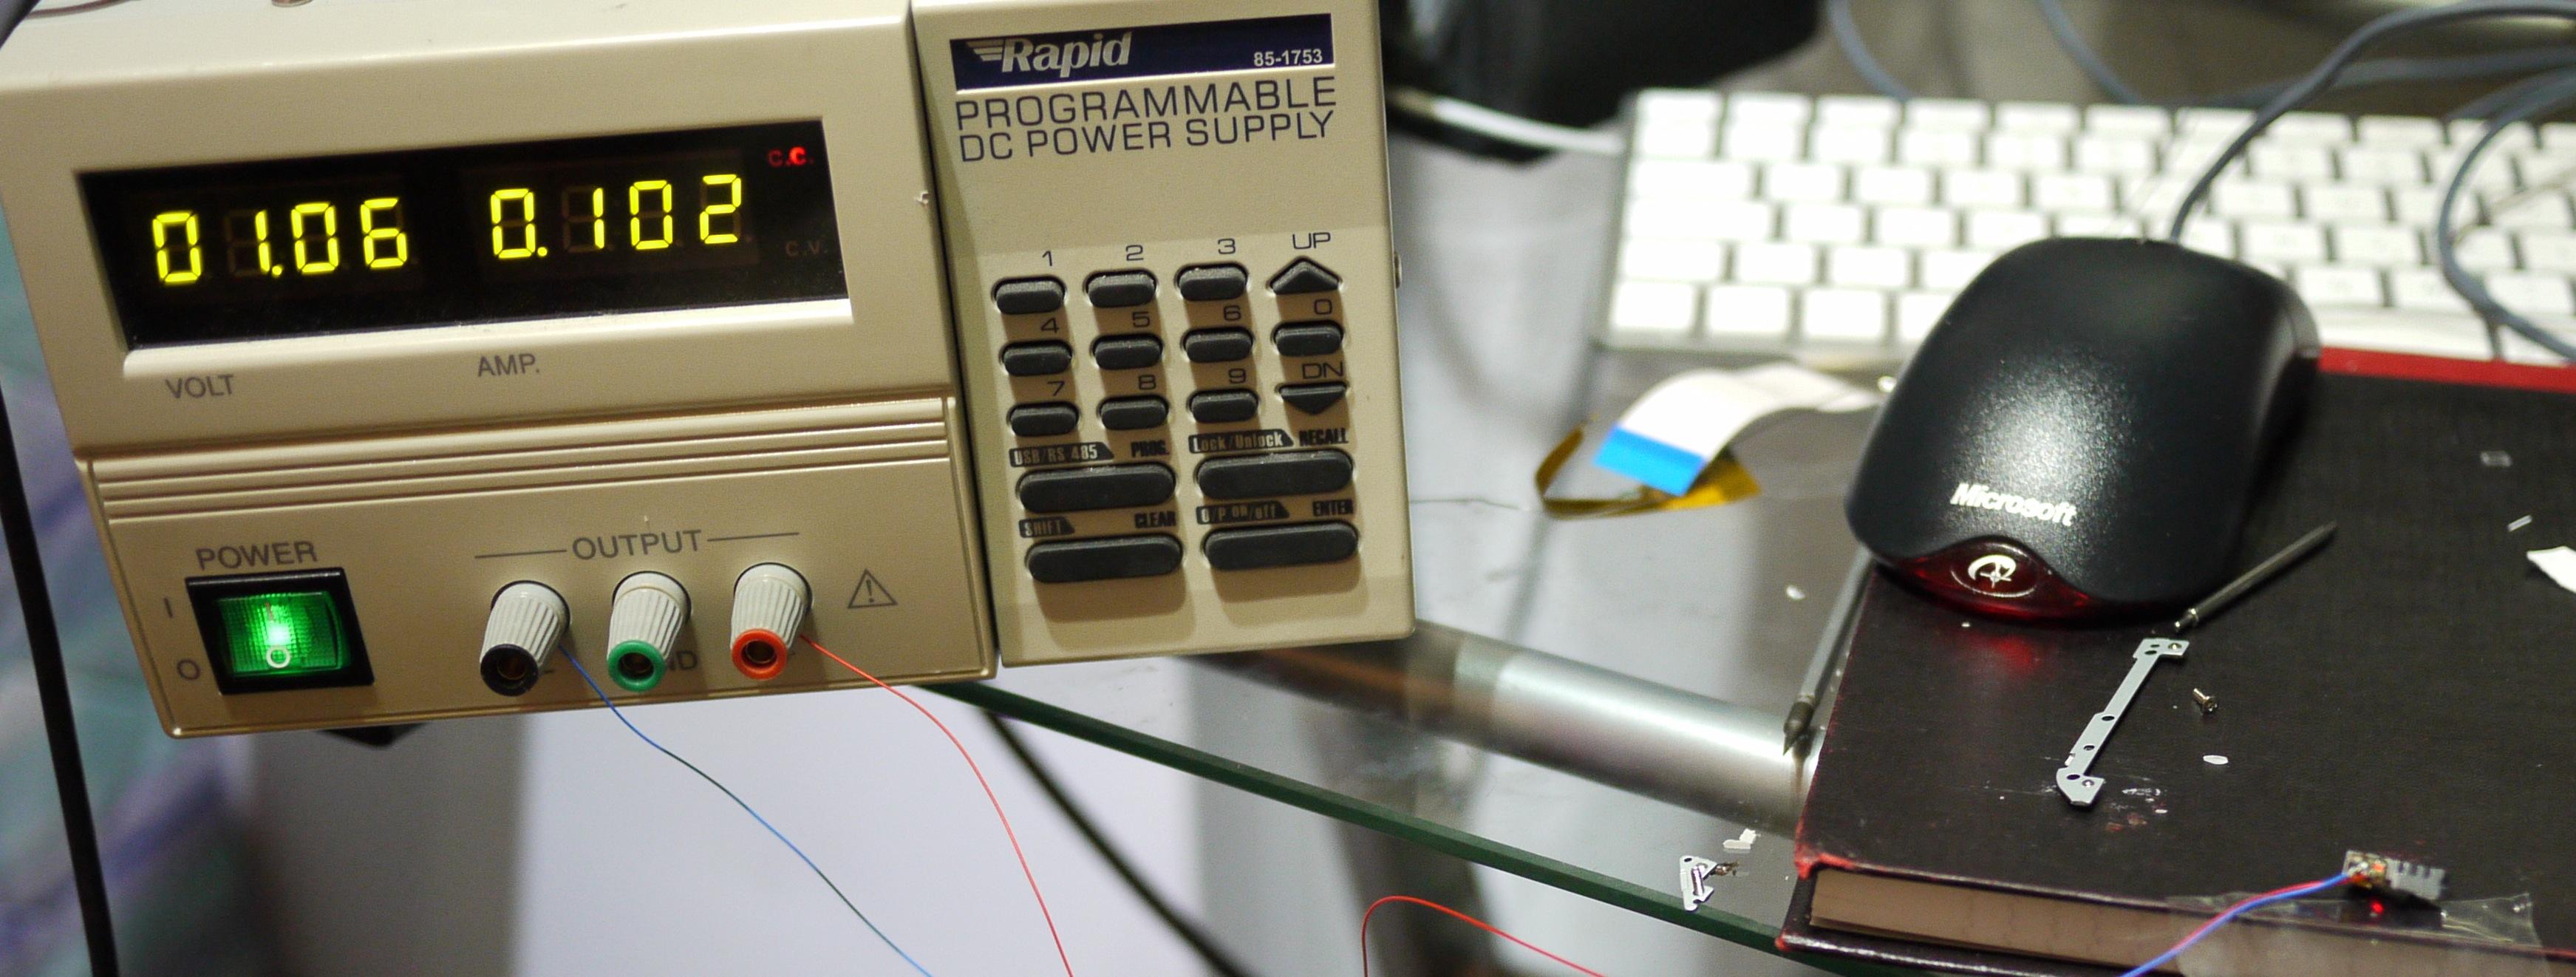 Laser Diode Dvd Burner 20x Rw Burning Doovi Eydt Loneoceans Laboratories Project 405 Free